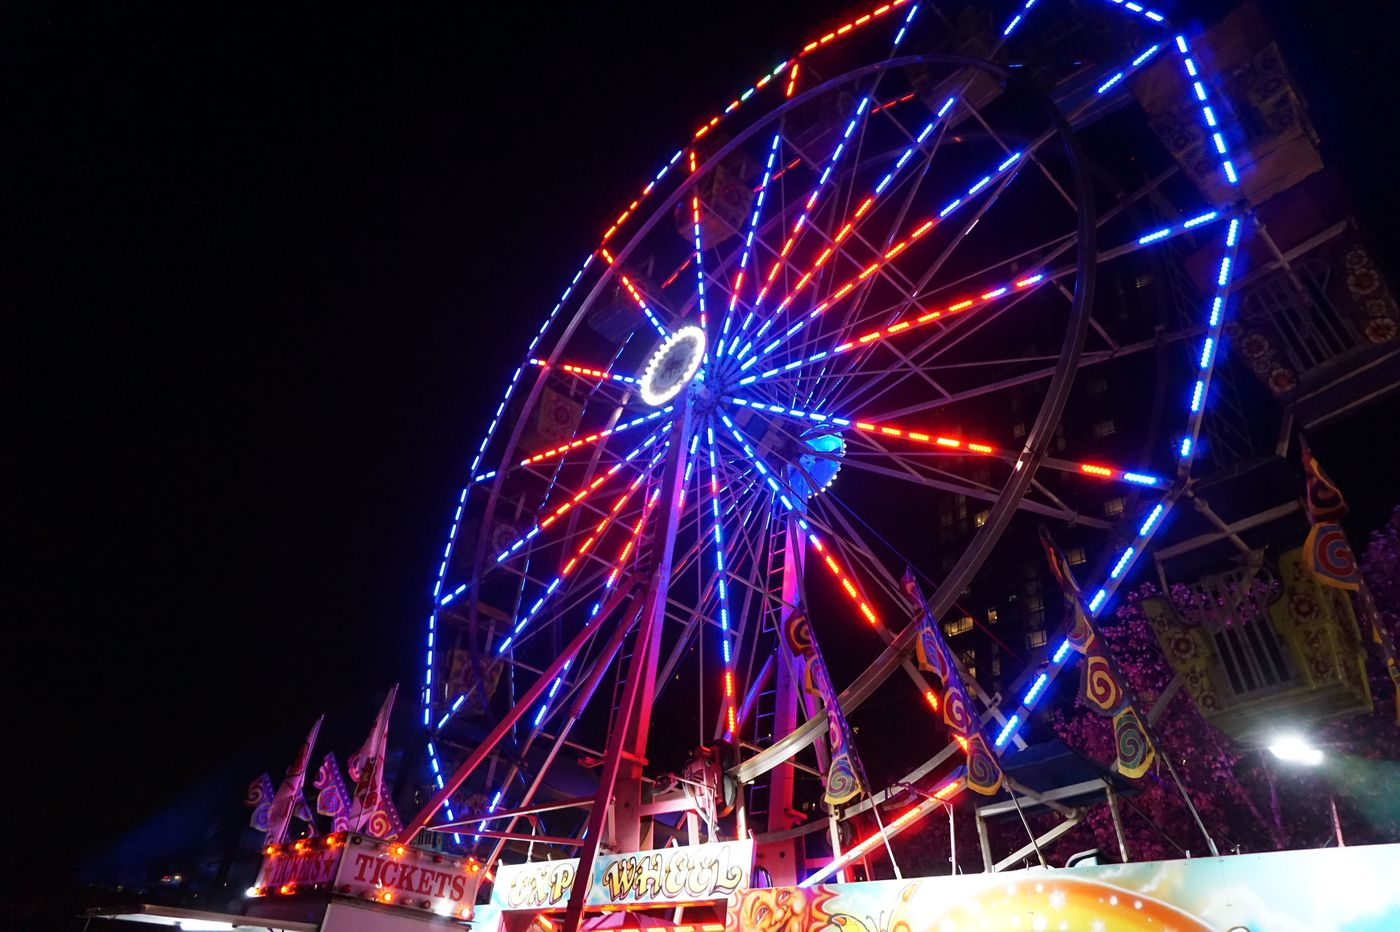 Christmas Village is adding a Ferris wheel